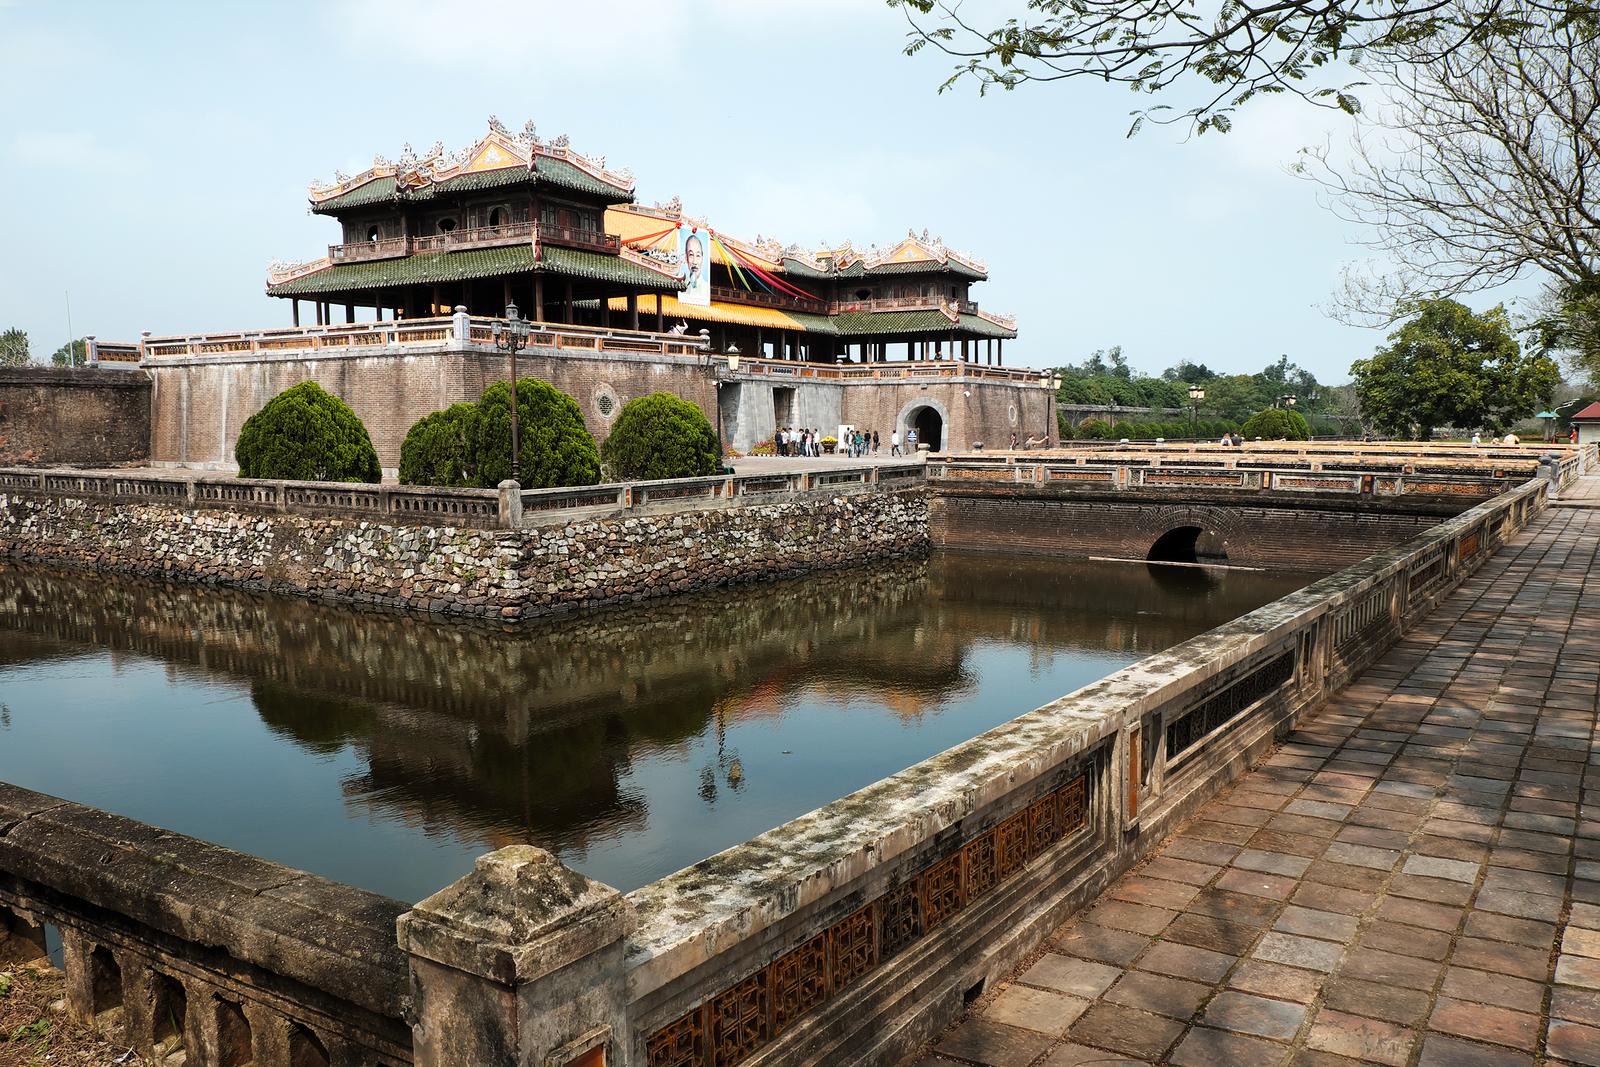 Hue Citadel Dai Noi Vietnam Ngo Mon